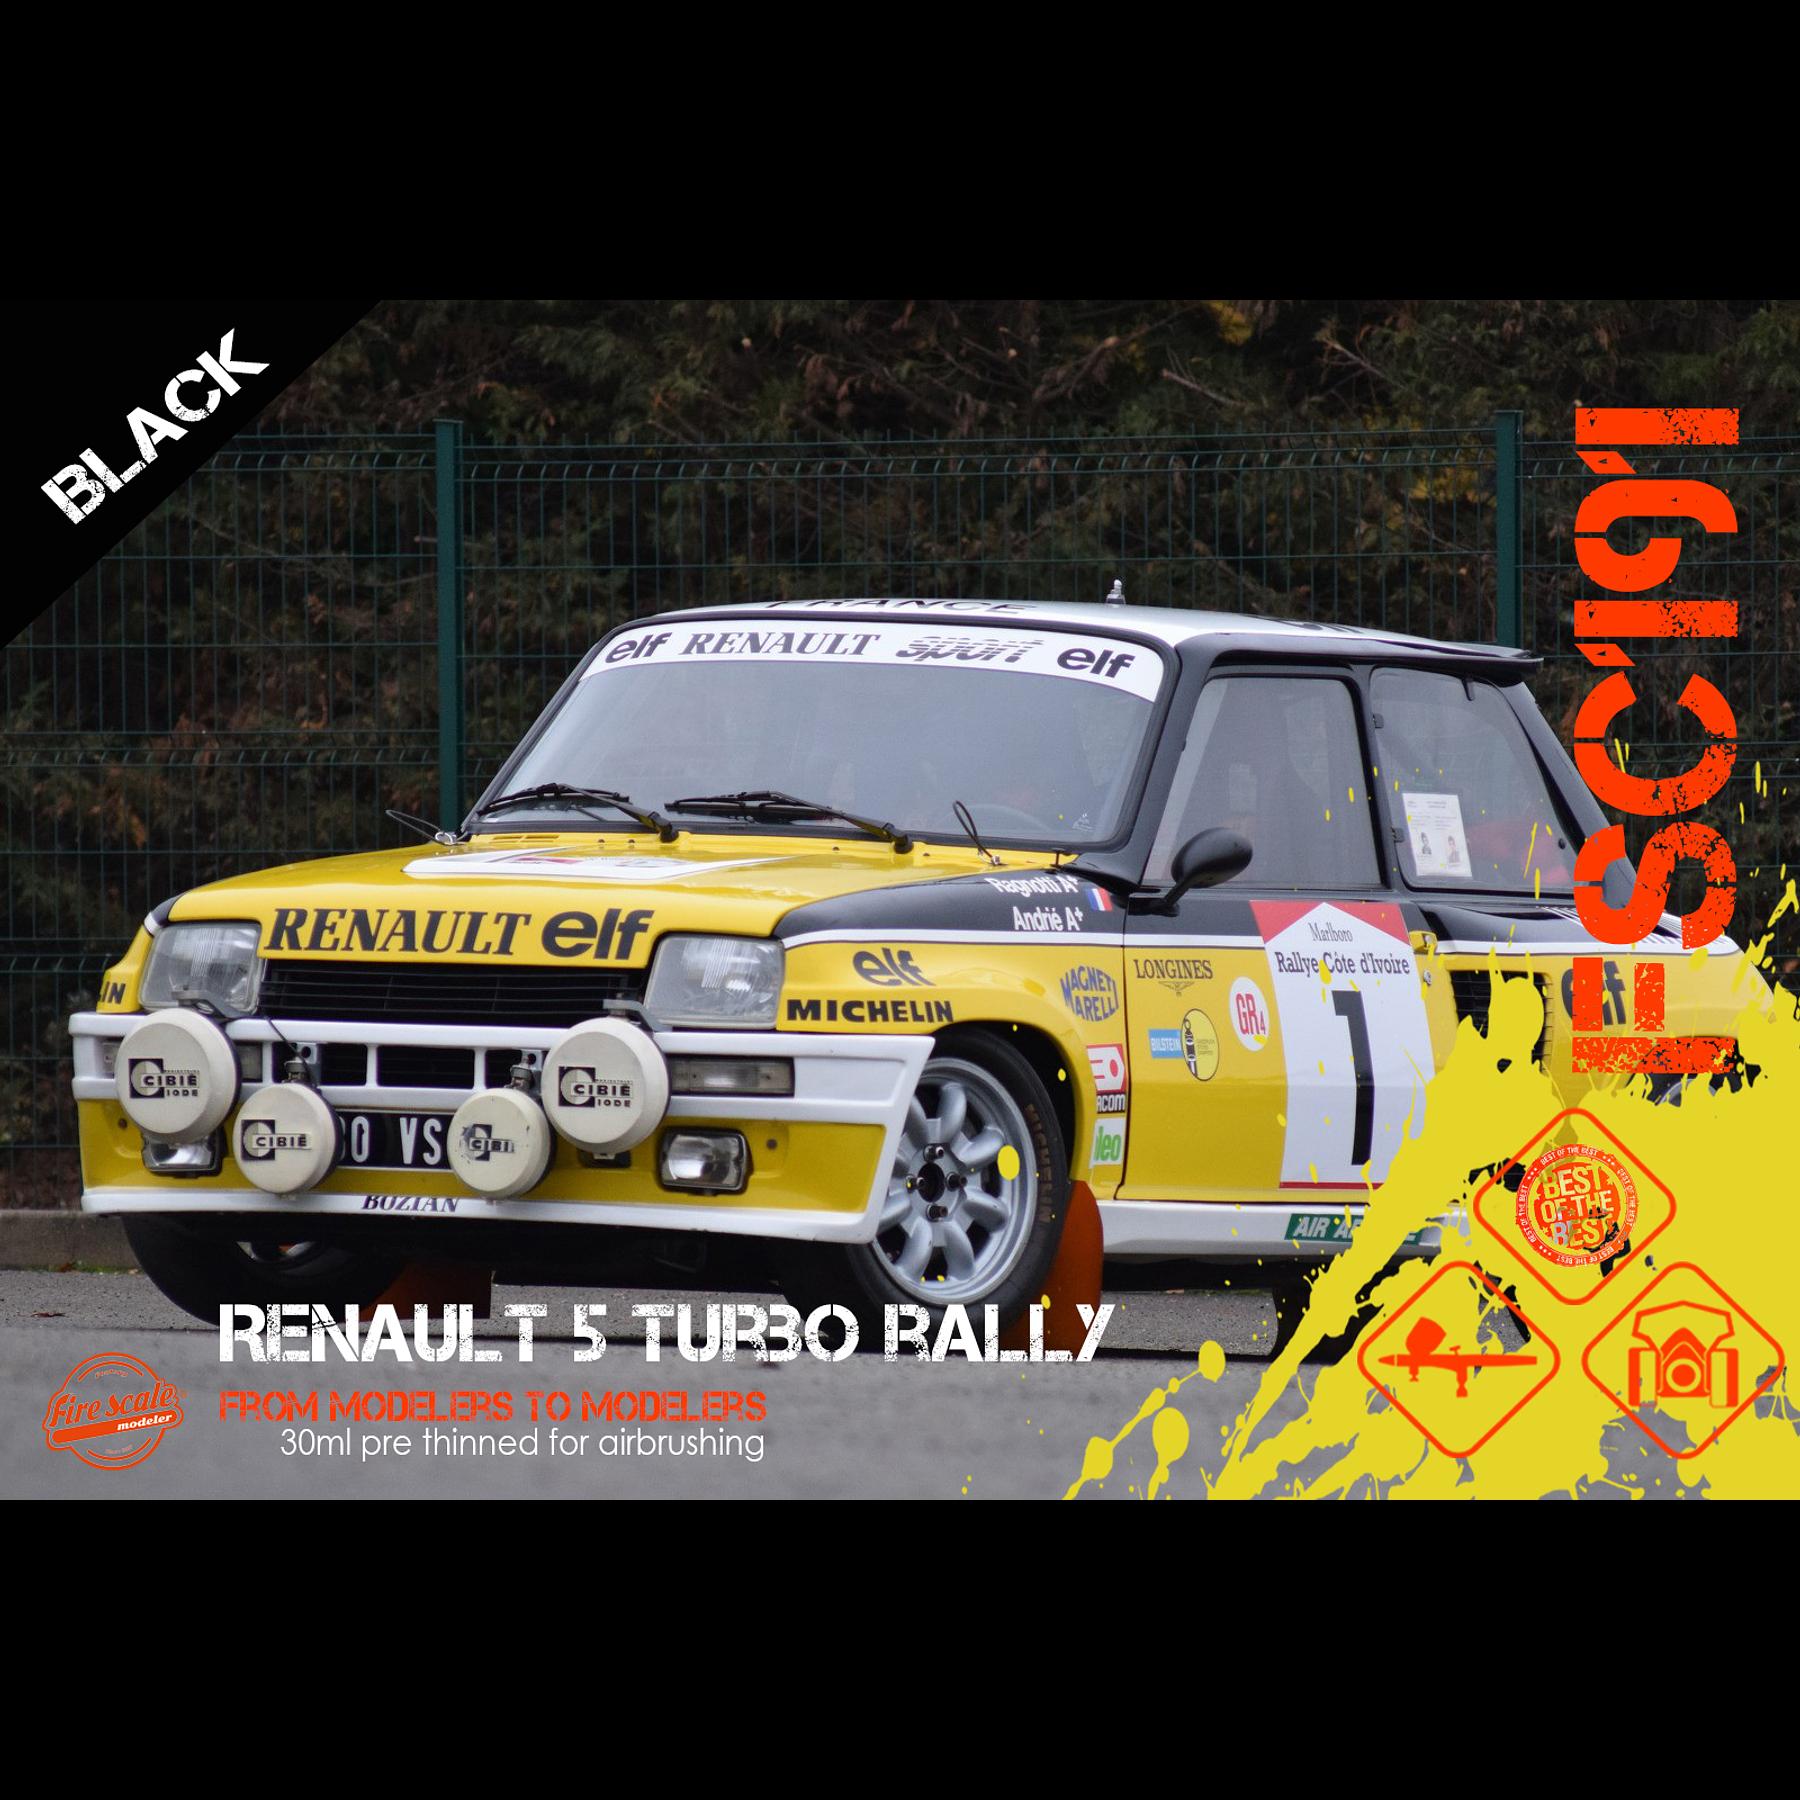 Renault 5 Turbo Rally - Negro